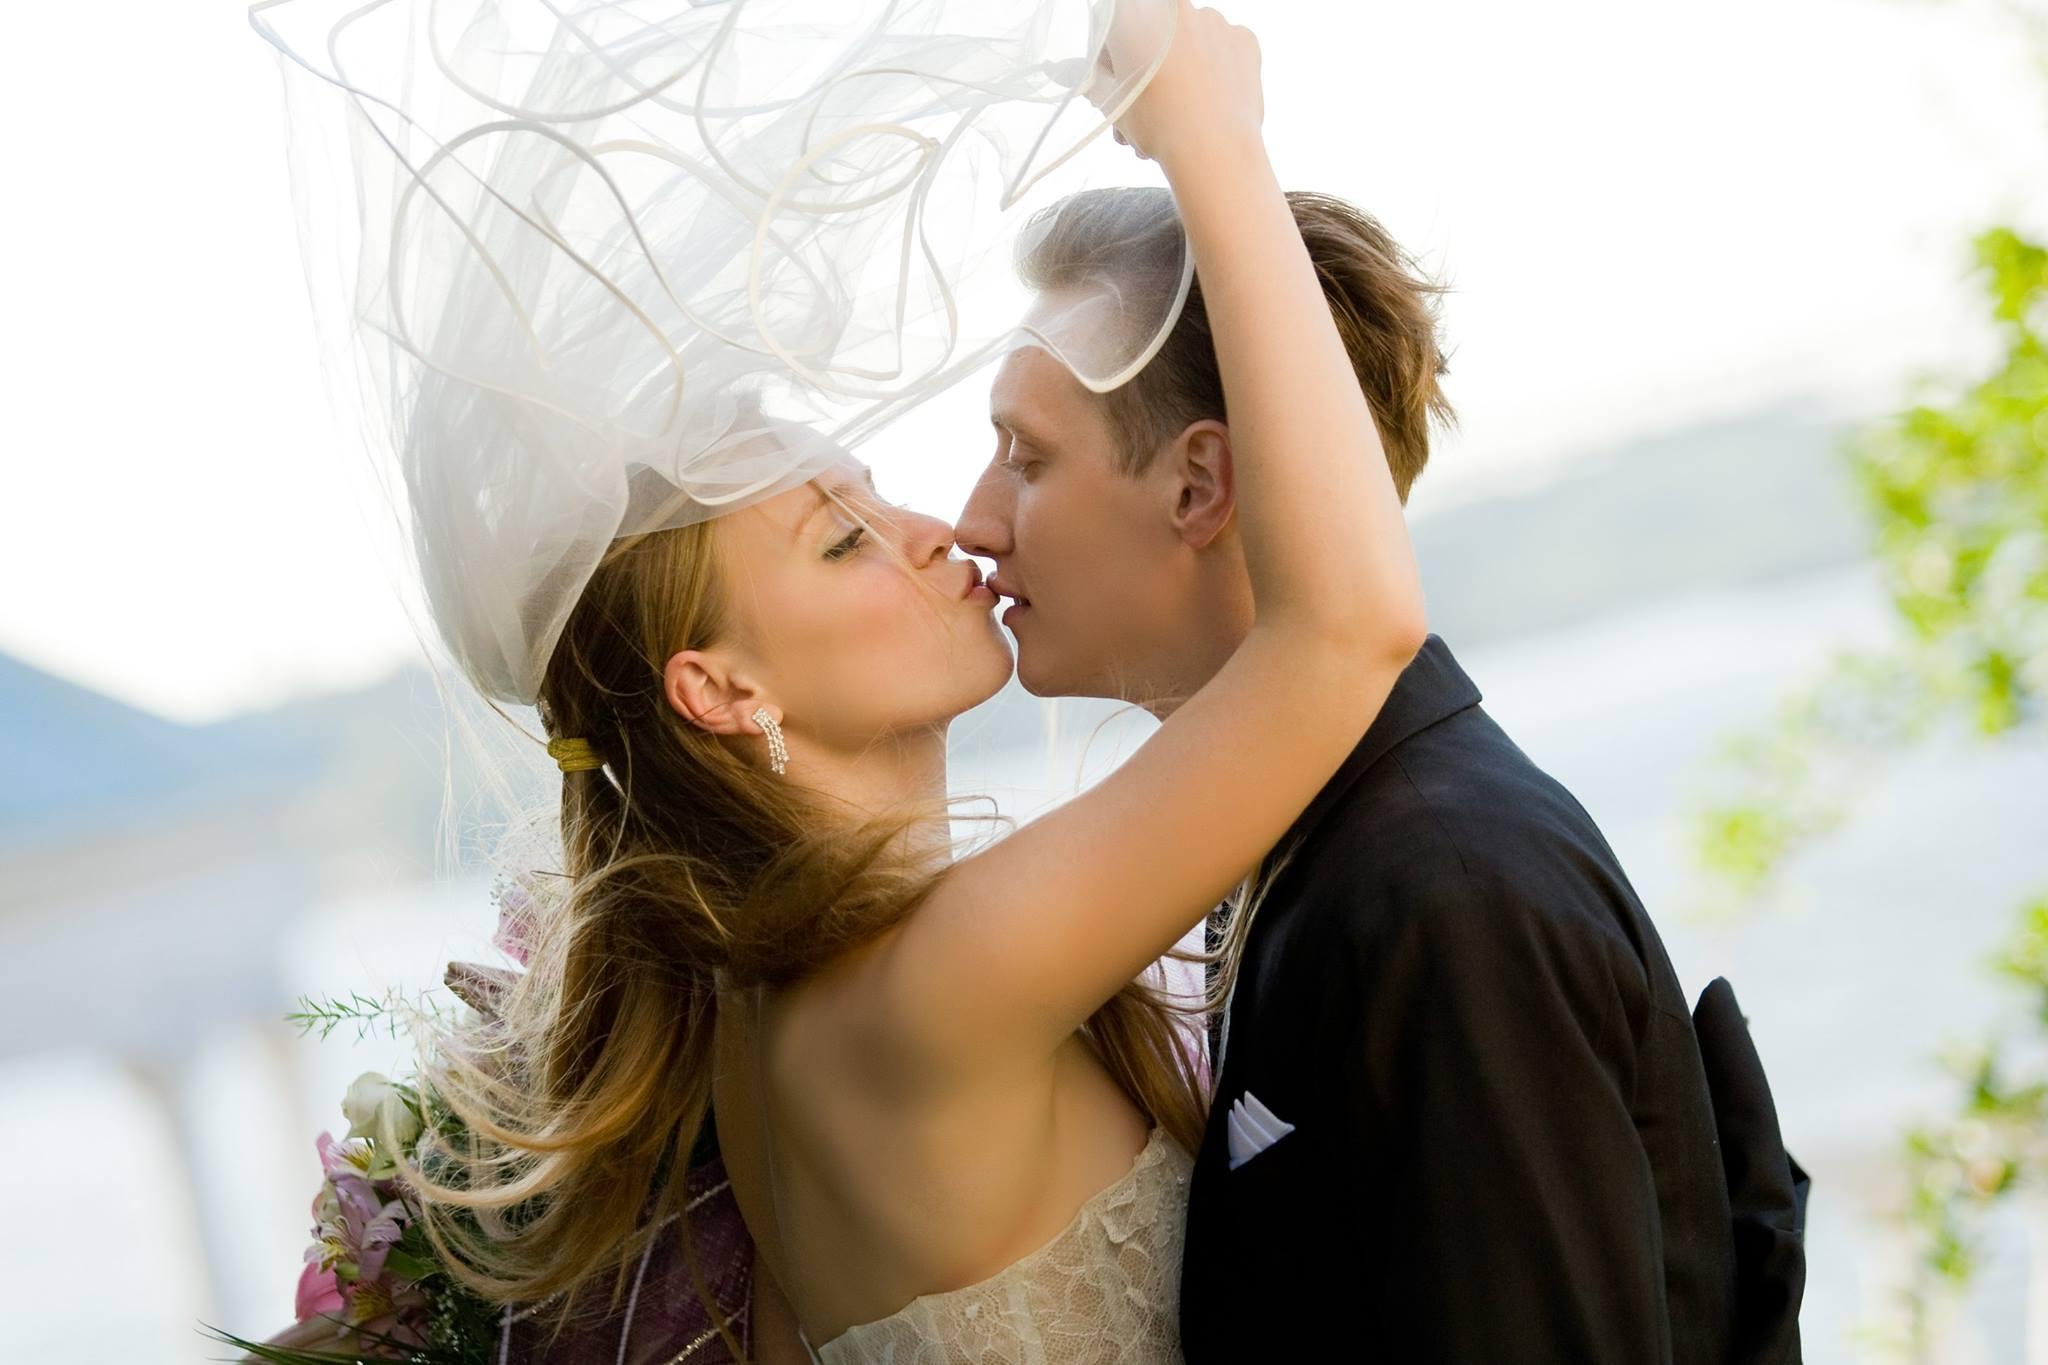 صور عريس وعروسه يوم الزفاف 13 صور عريس وعروسه يوم الزفاف